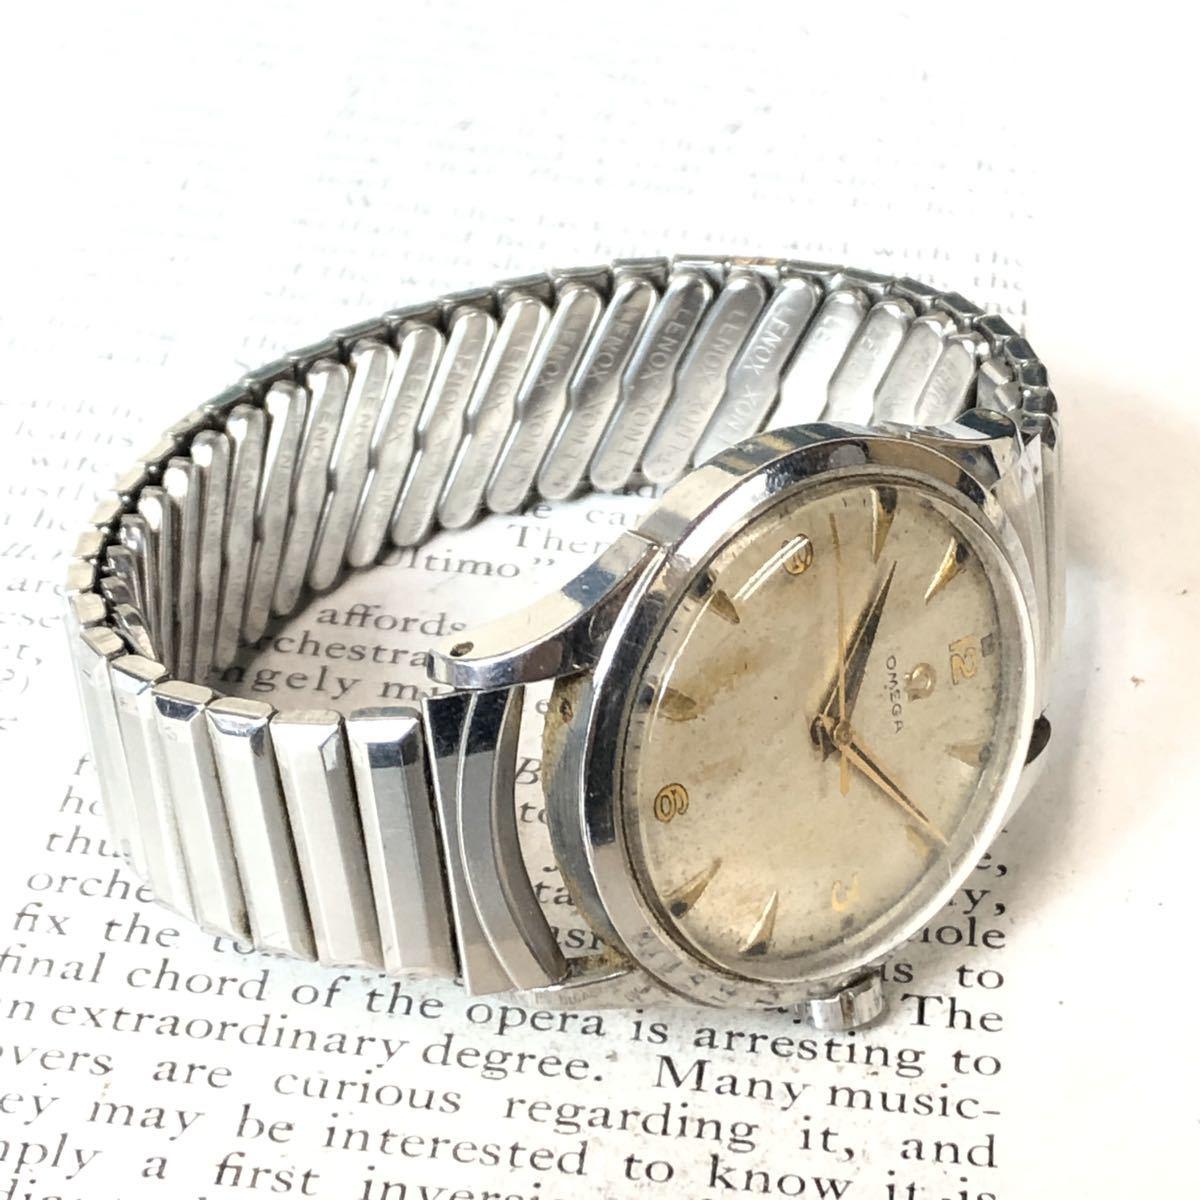 OMEGA オメガ 腕時計 機械式 自動巻 ハーフロータリー SWISS MADE スイス SS 3針 ビンテージ 希少 値下げ交渉あり 稼動品 W1519_画像5